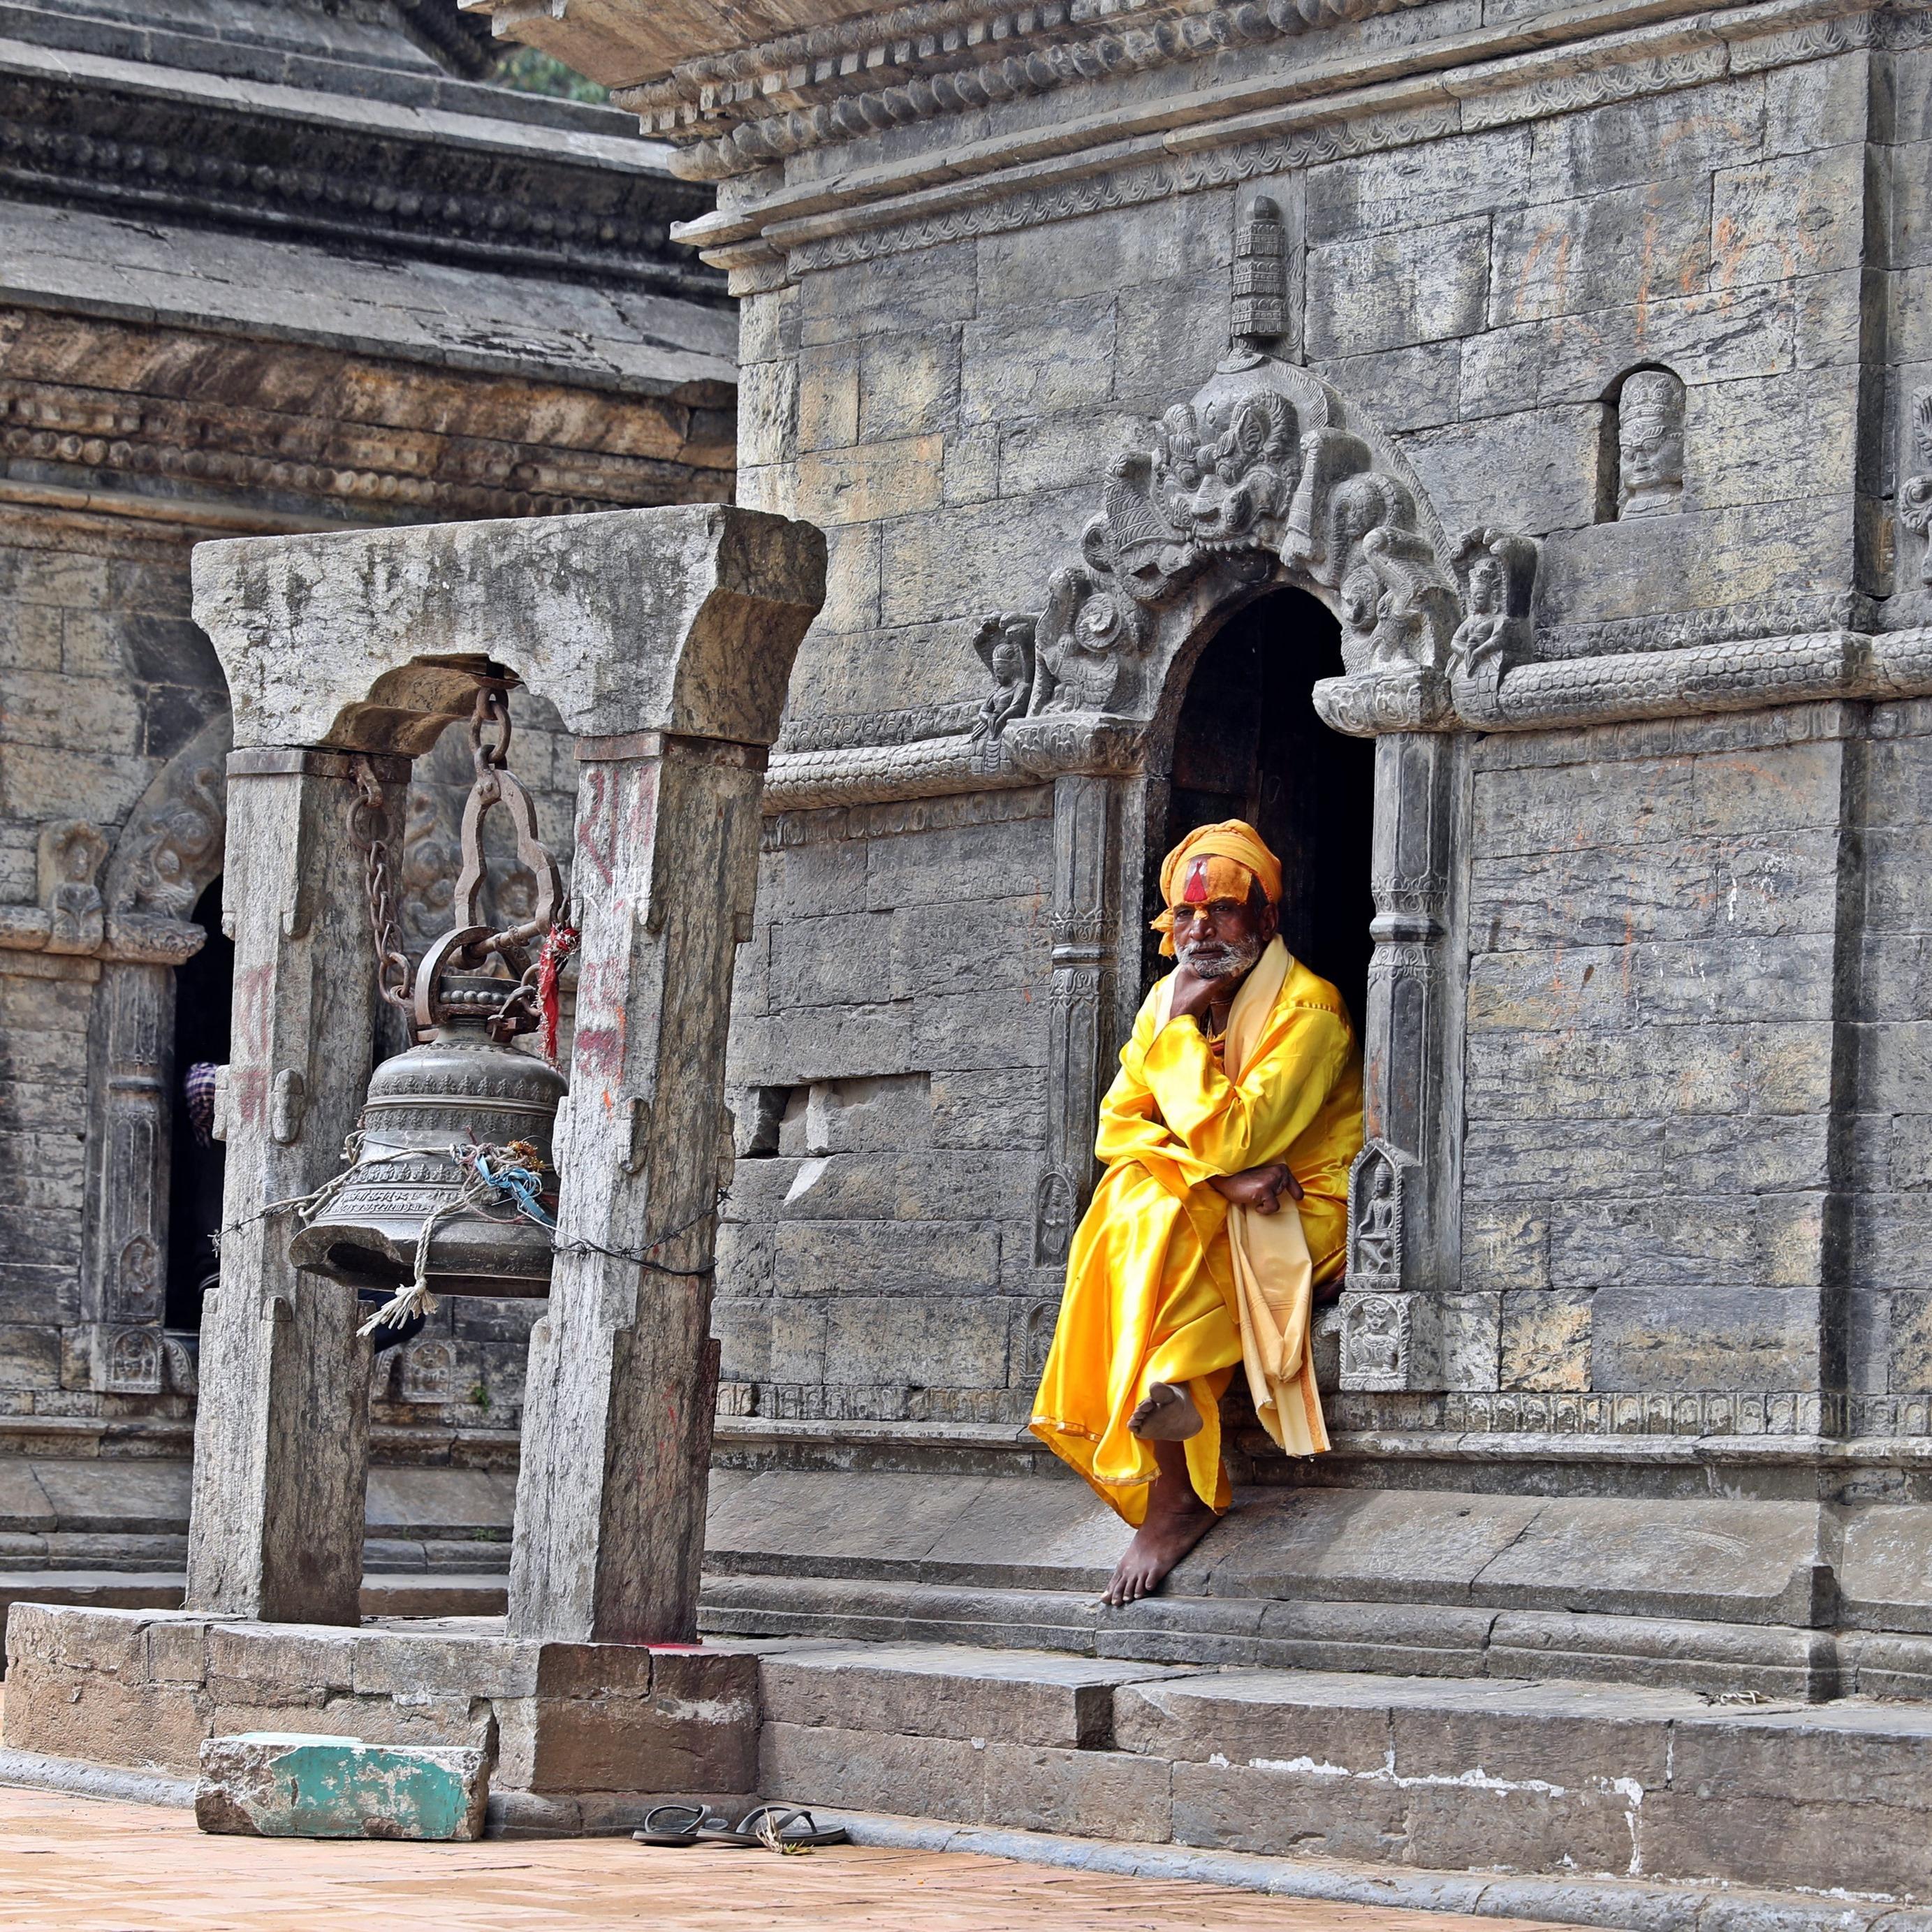 Sadhu at Pashupatinath, Kathmandu